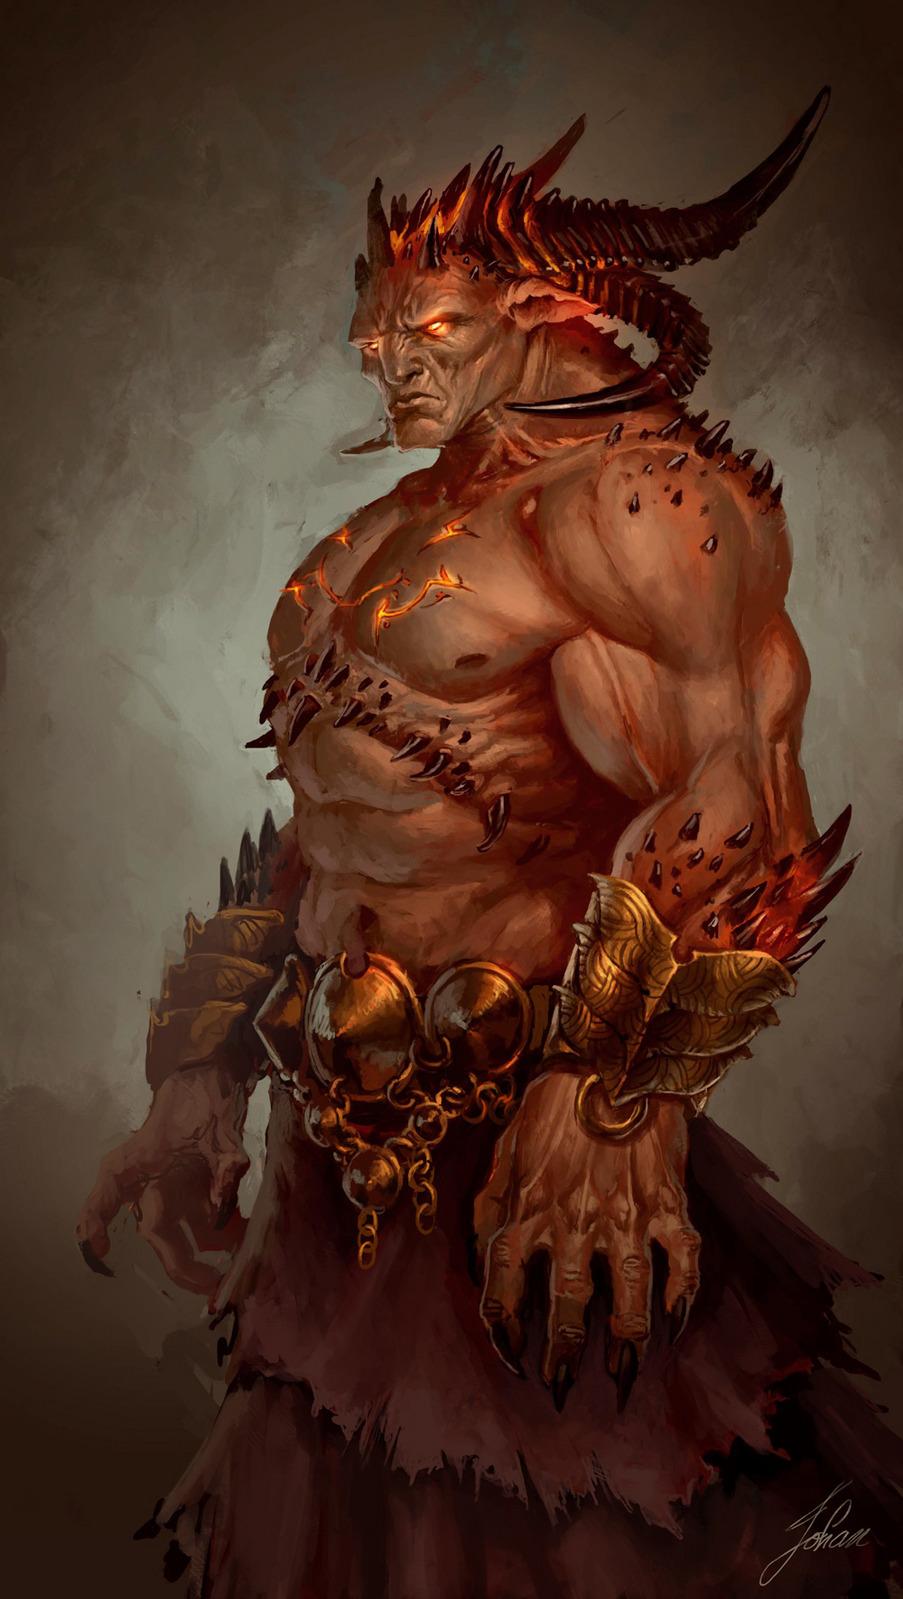 Drawn demon demon lord Johan_g johan_g lord Demon Pinterest